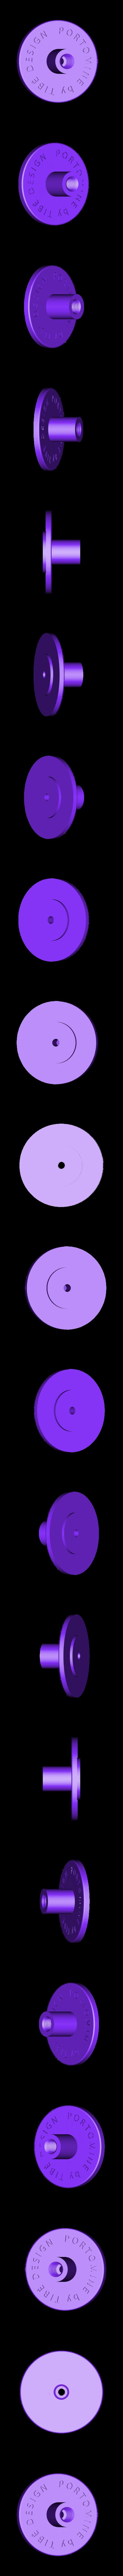 portomine_support_fixation01.STL Download STL file Portomine butterfly hook • 3D printing design, Tibe-Design